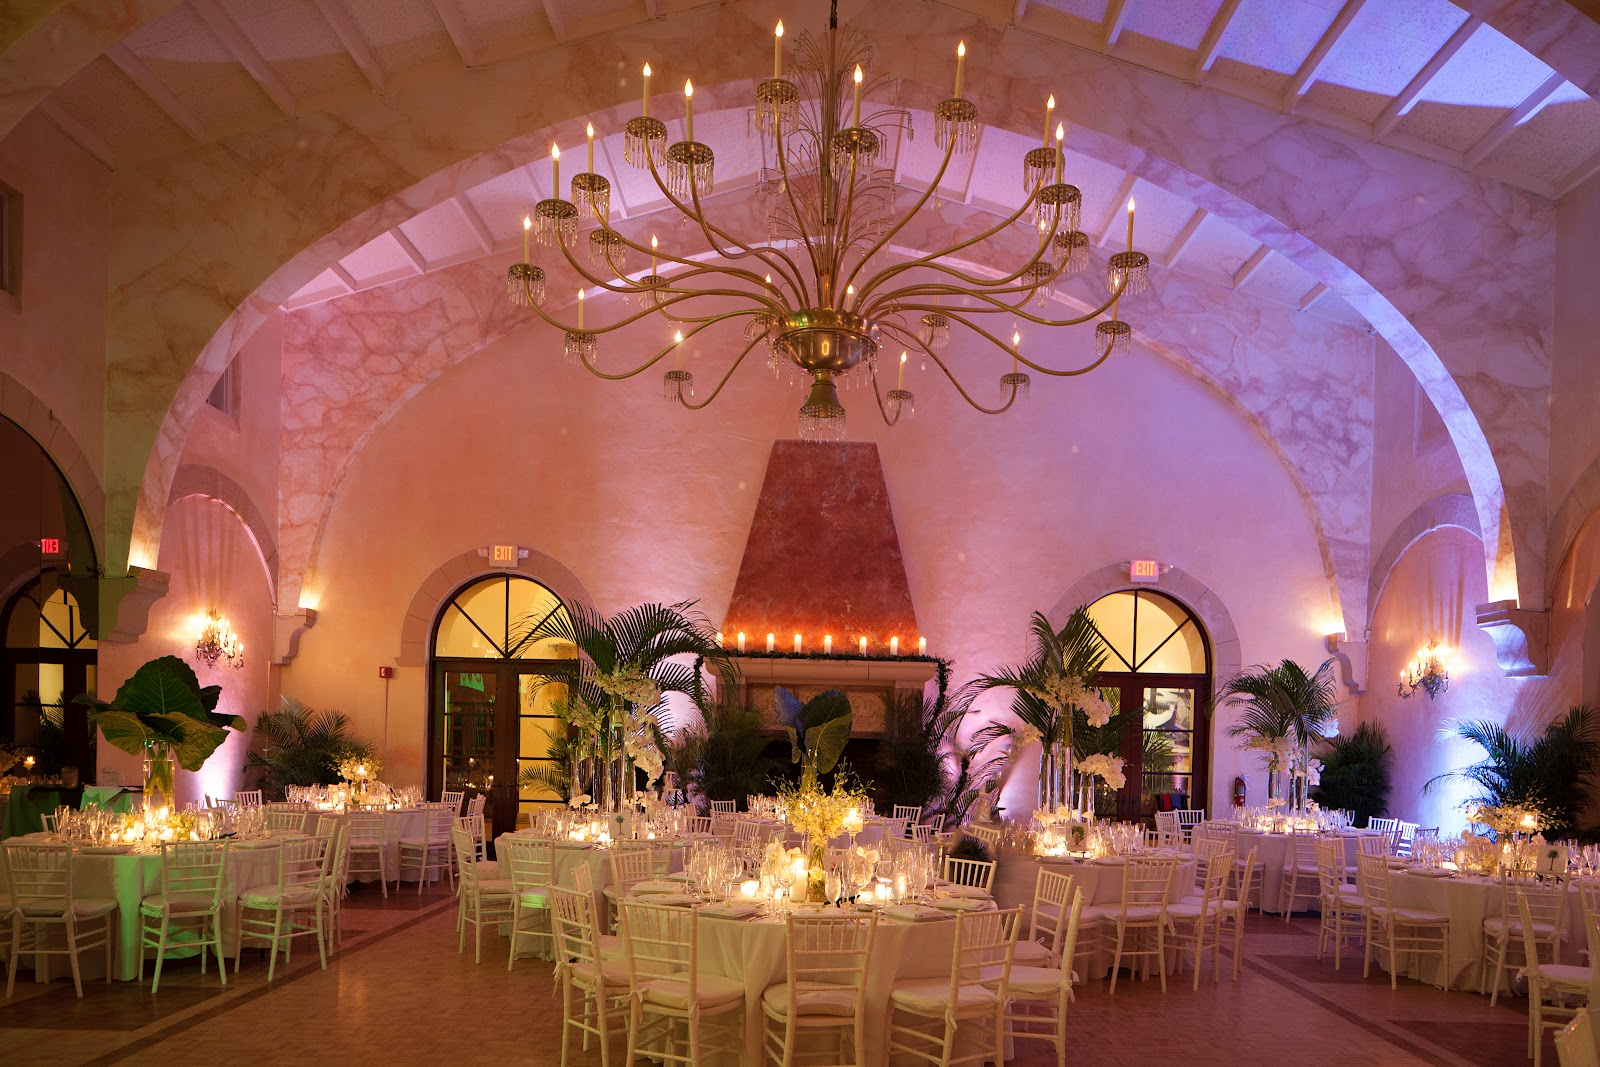 ocean flowers divine design by guerdy caicedo wedding surf club. Black Bedroom Furniture Sets. Home Design Ideas